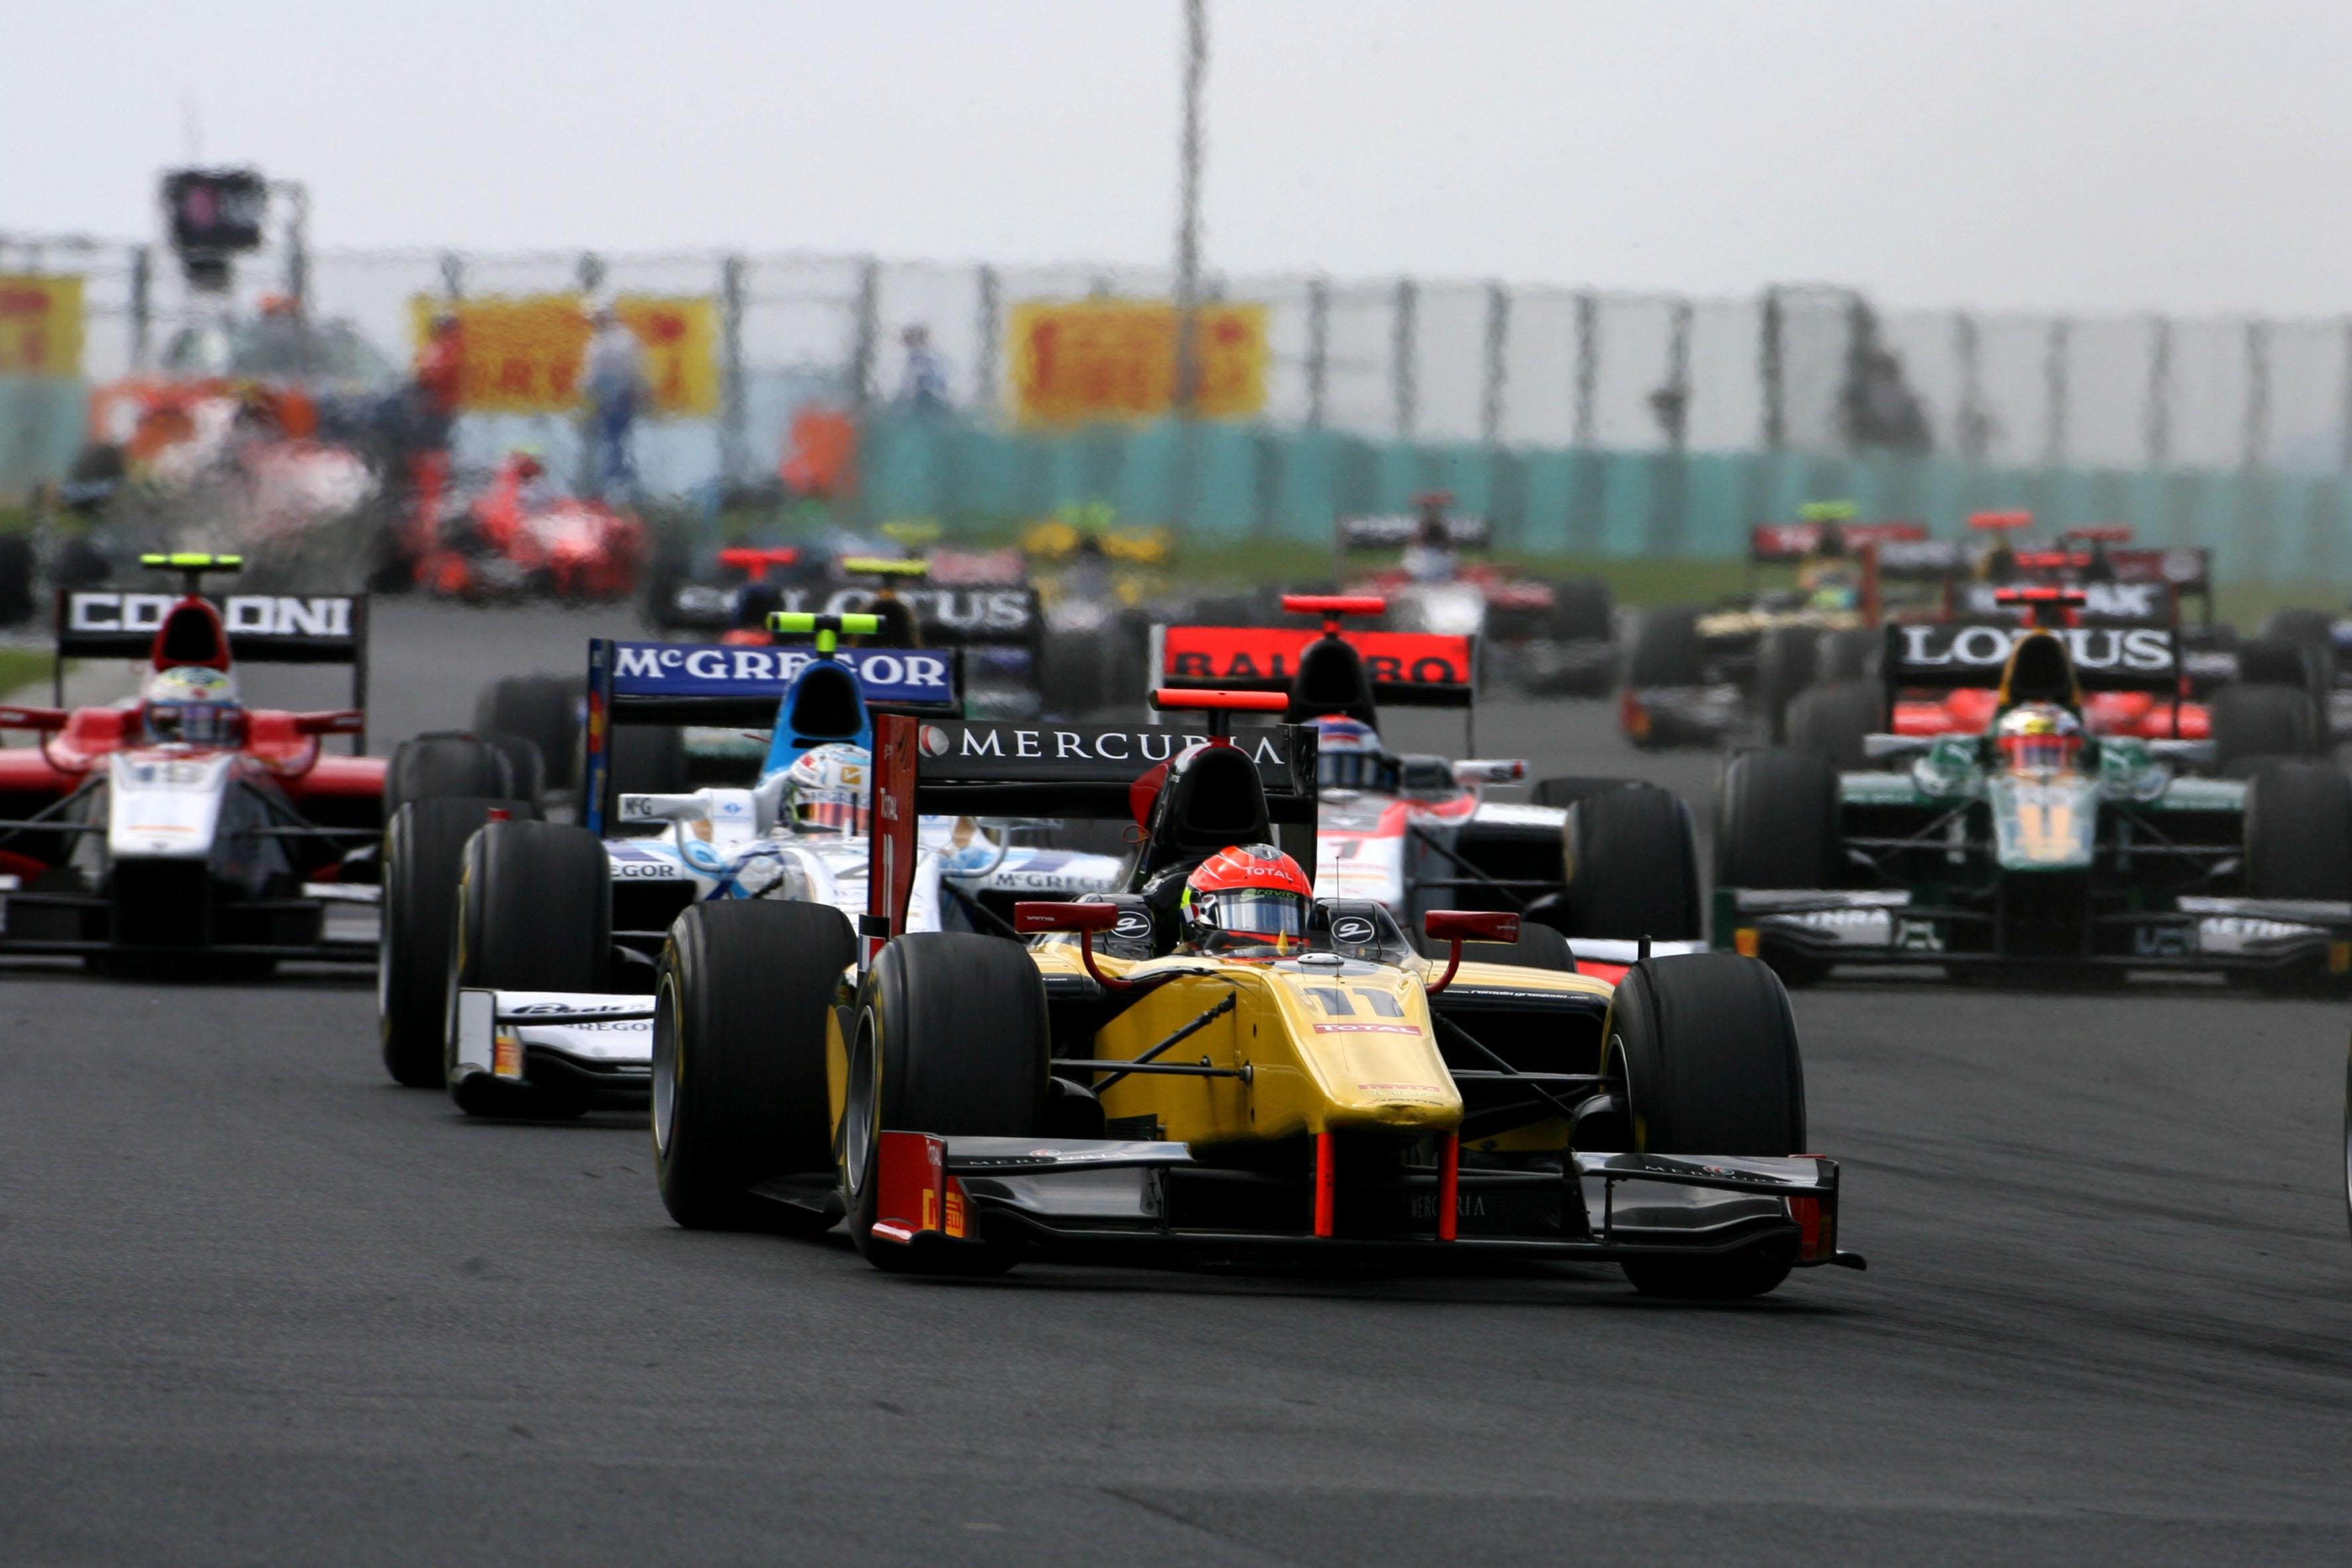 Romain Grosjean GP2 2011